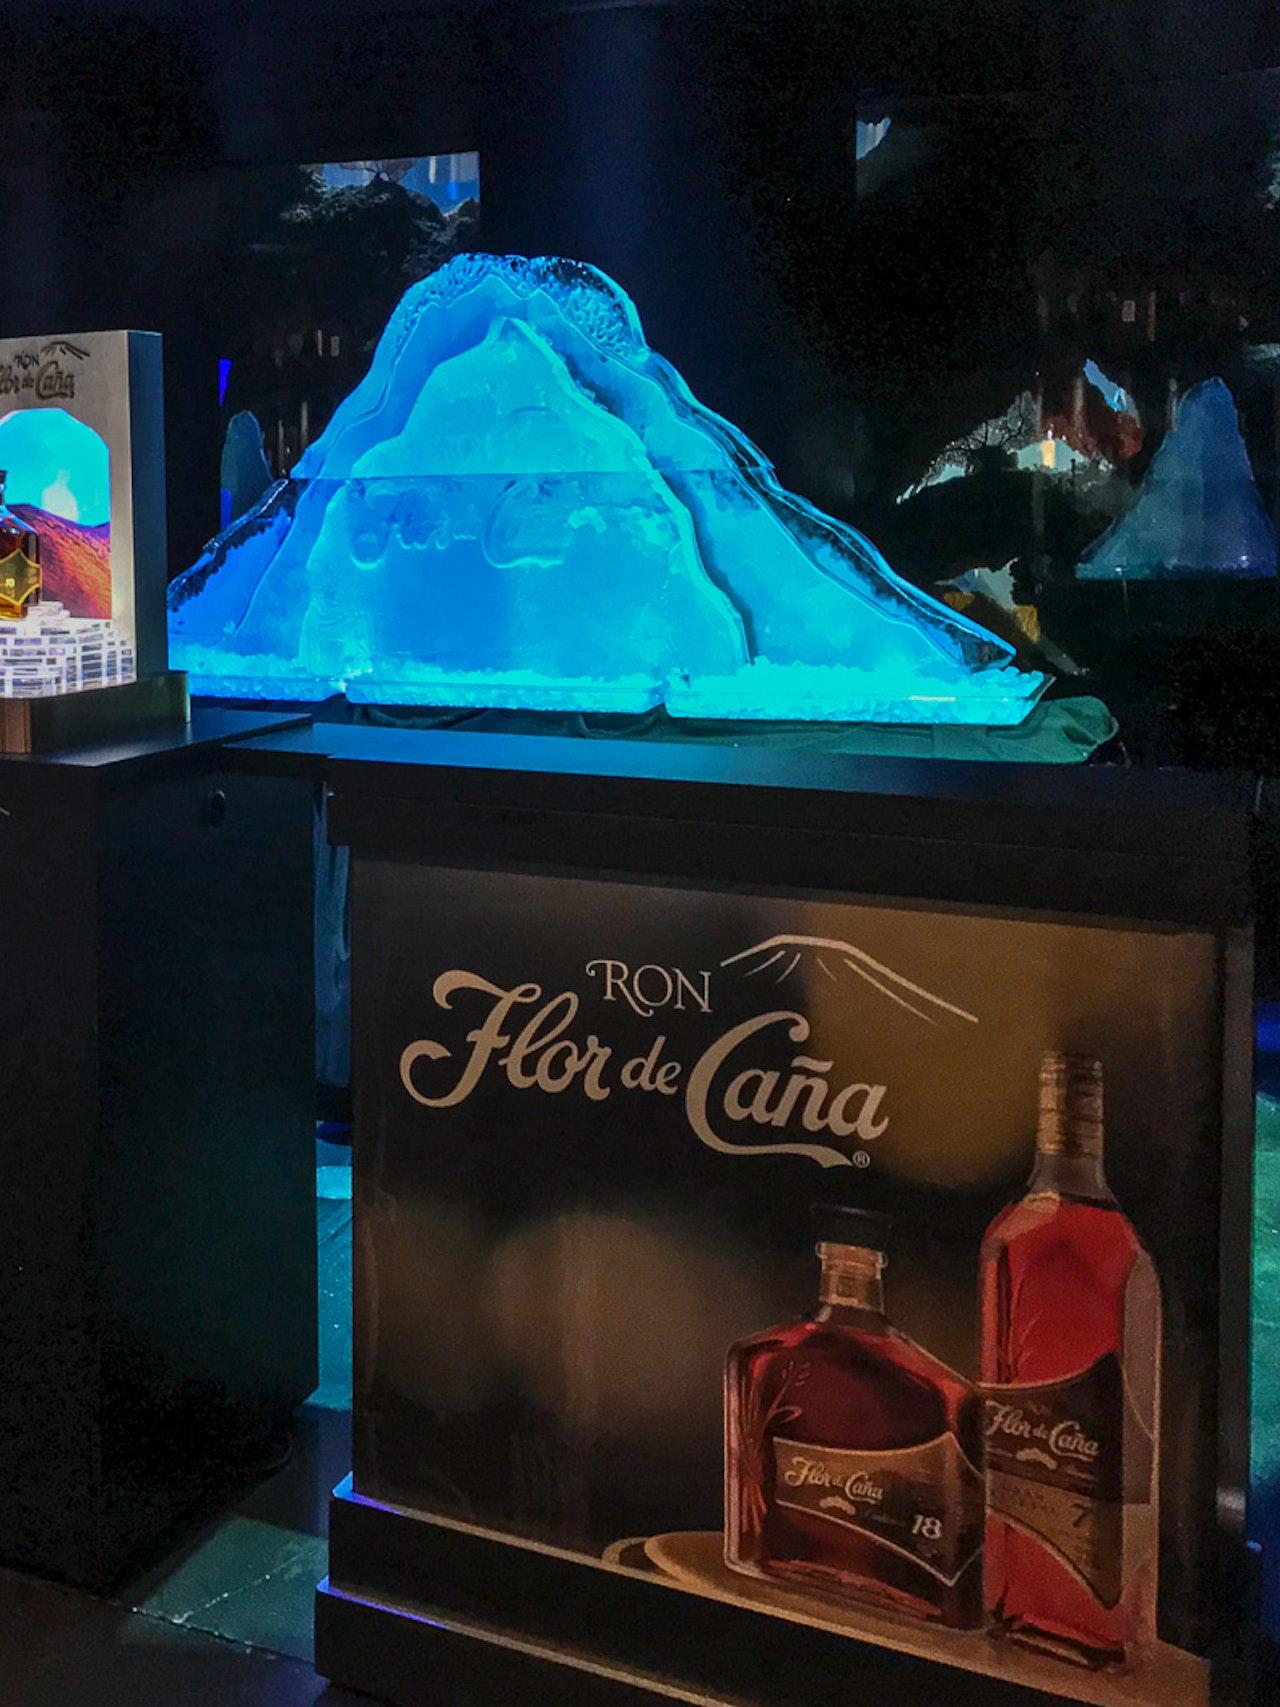 FLOR DE CAÑA IGFA'S HALL OF FAME